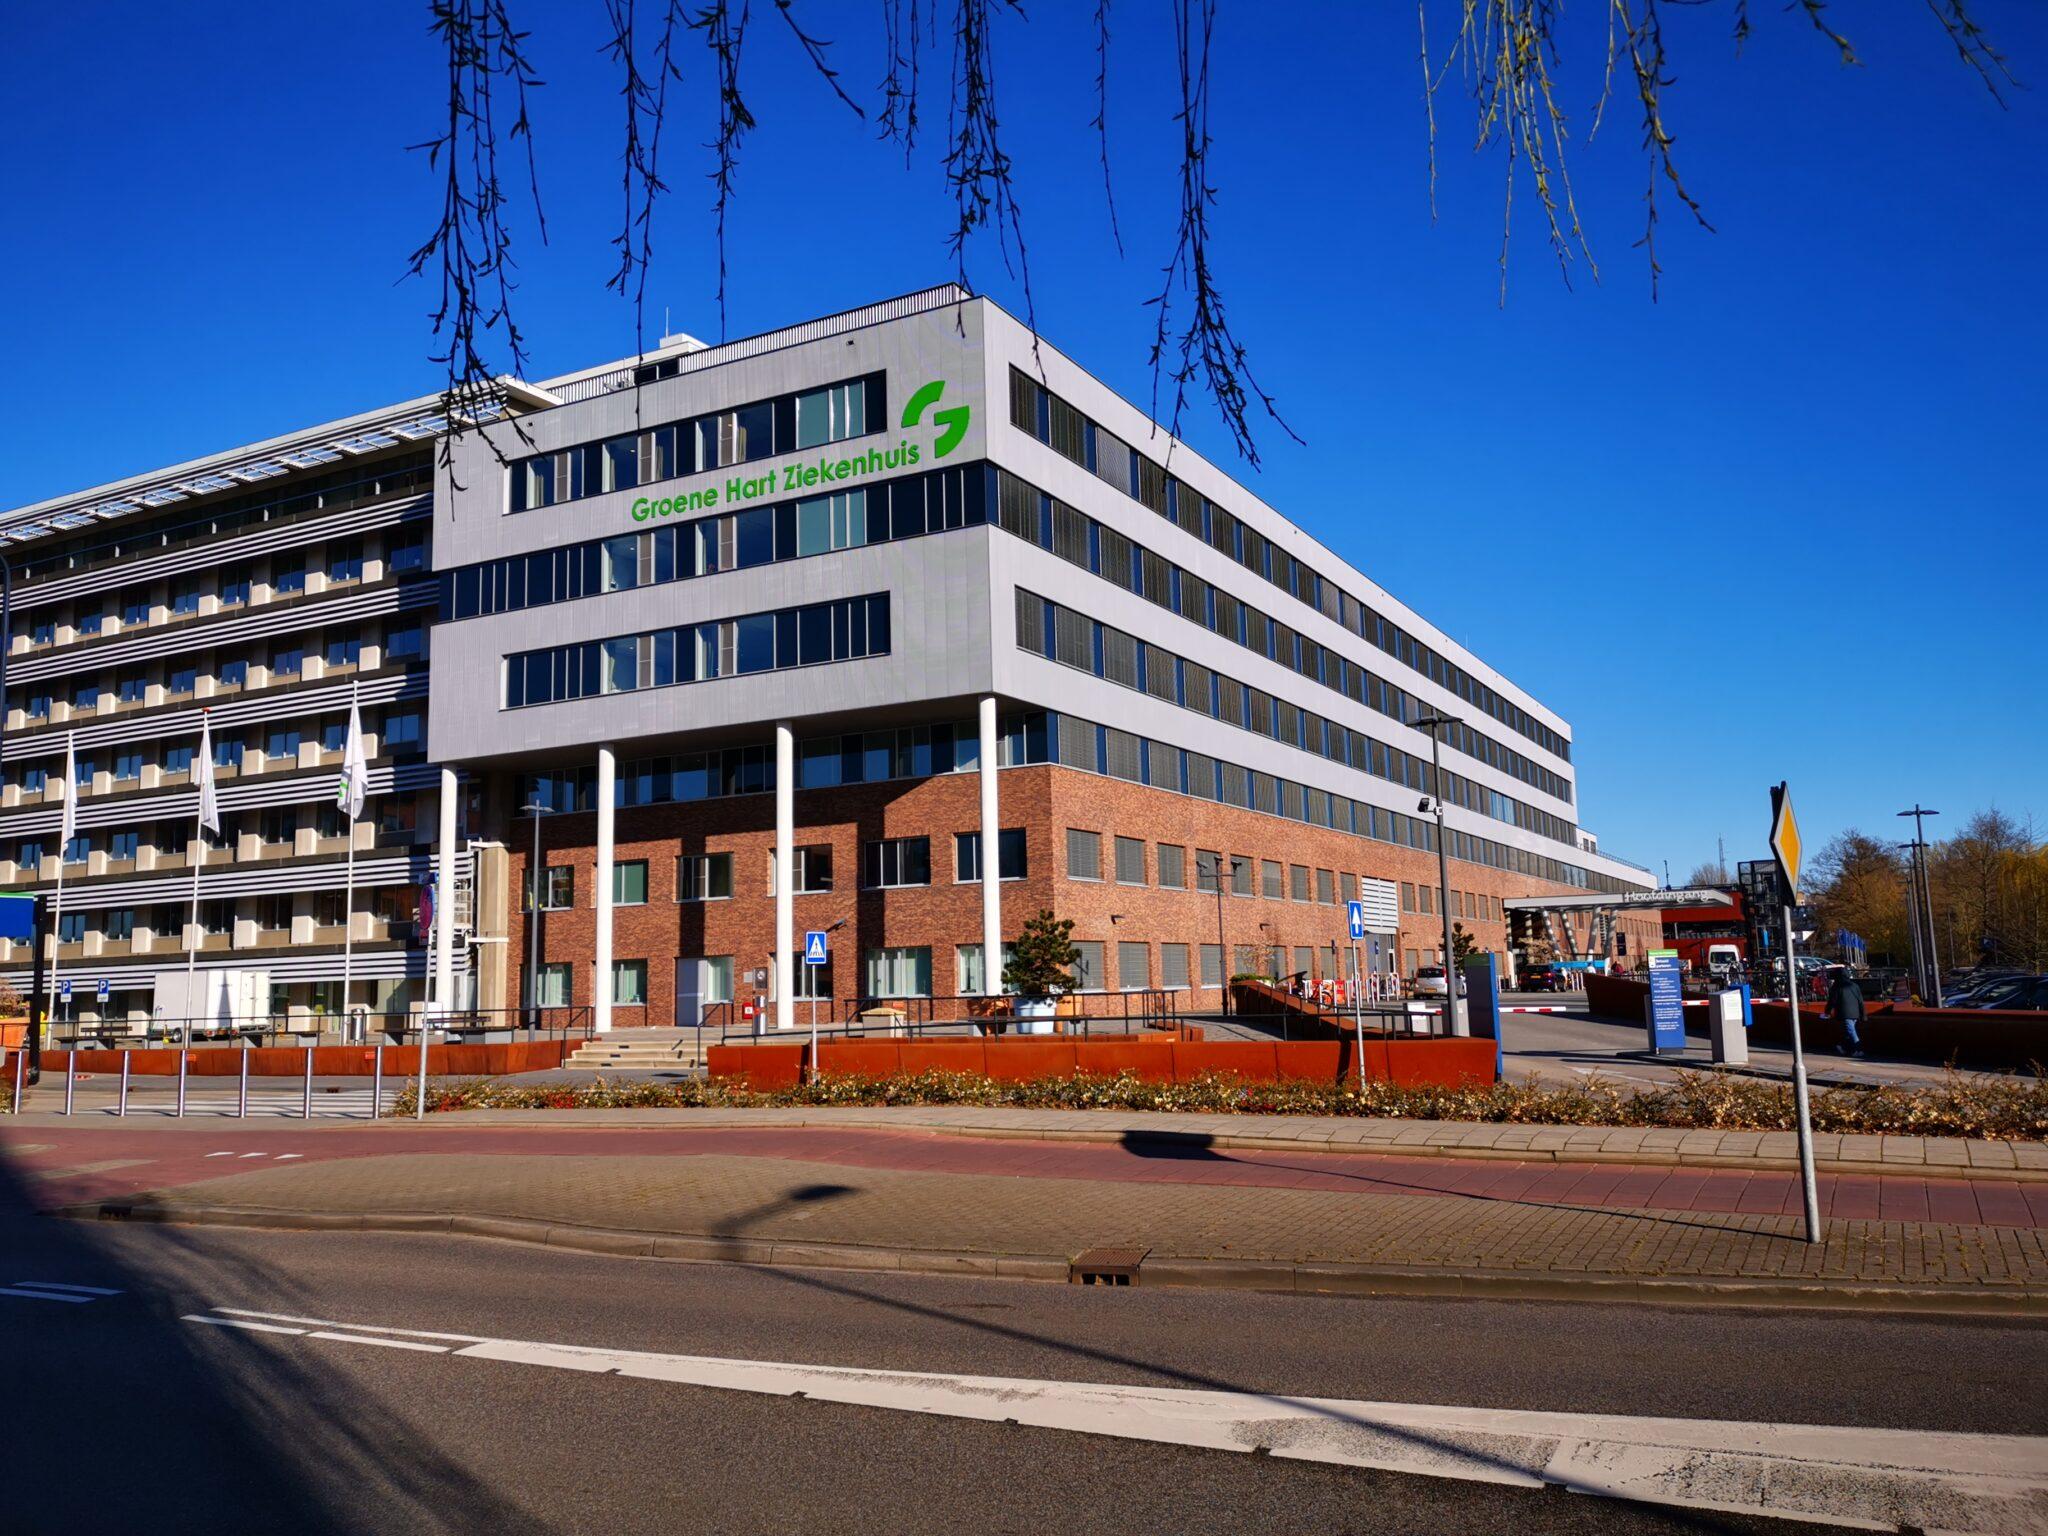 groene hart ziekenhuis corona